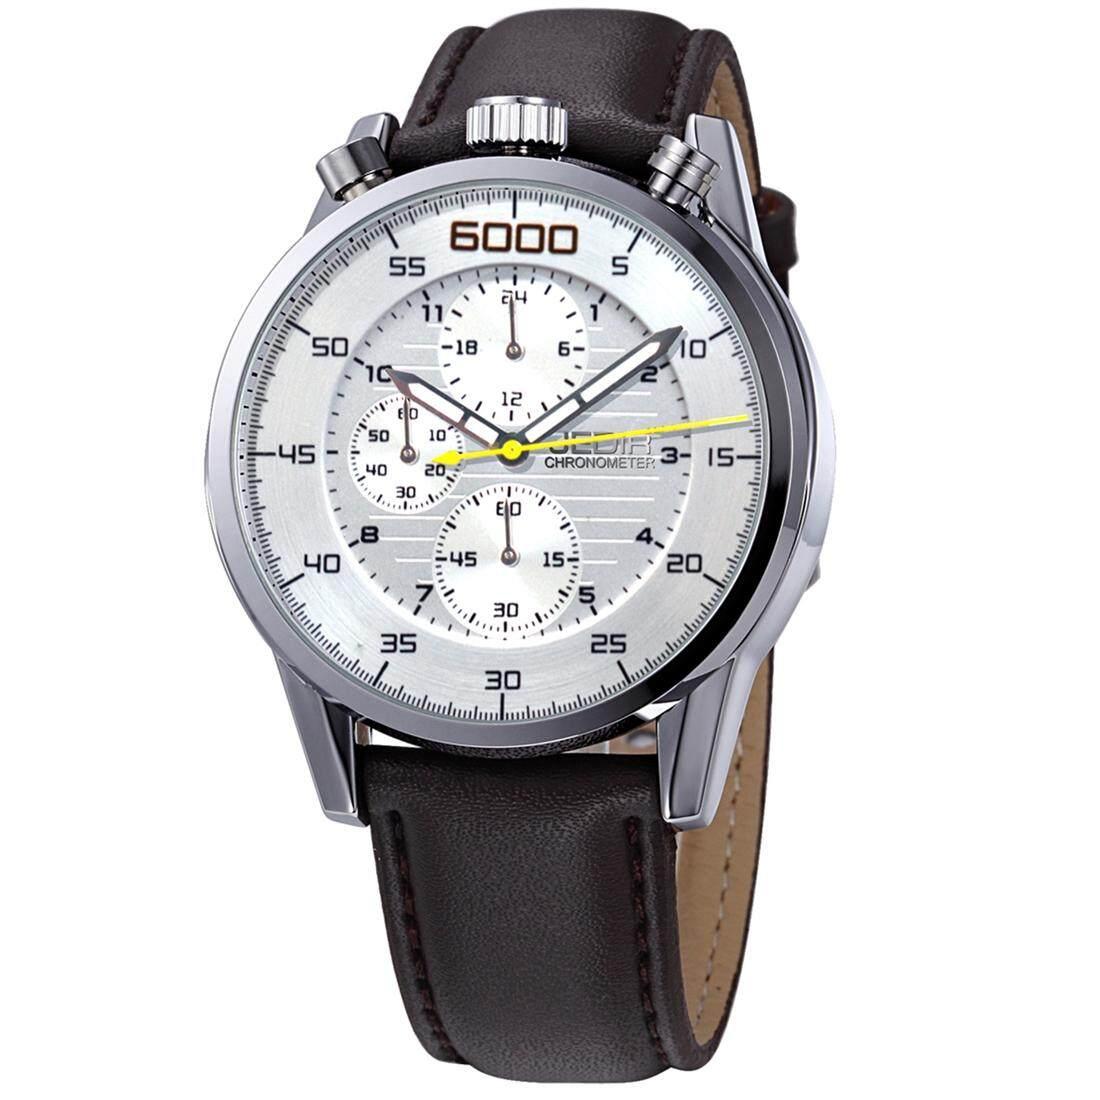 JEDIR 528004 3ATM Waterproof Arabic Numerals Scale Quartz Movement Three  Functional Sub Dials(24 Hours 64aef4abea2